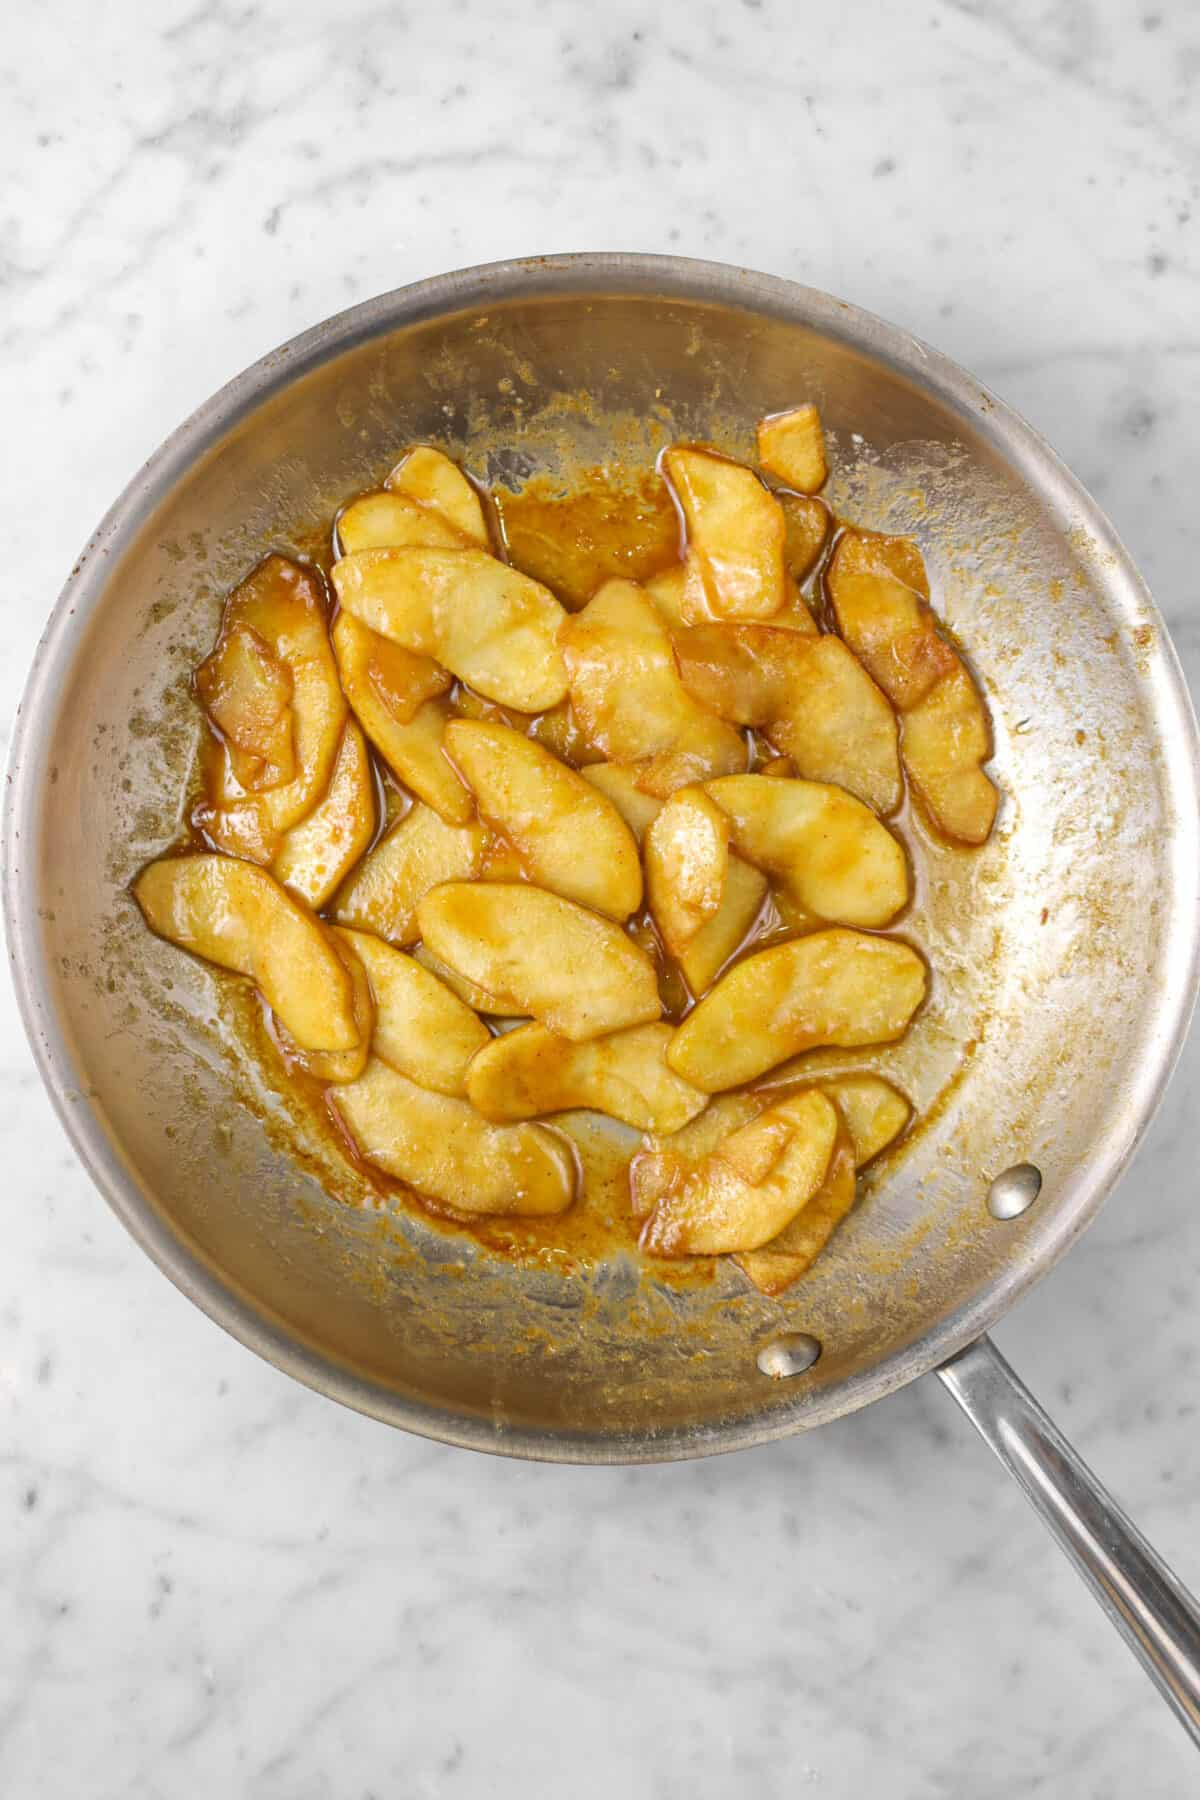 Sautéed apples in a pan